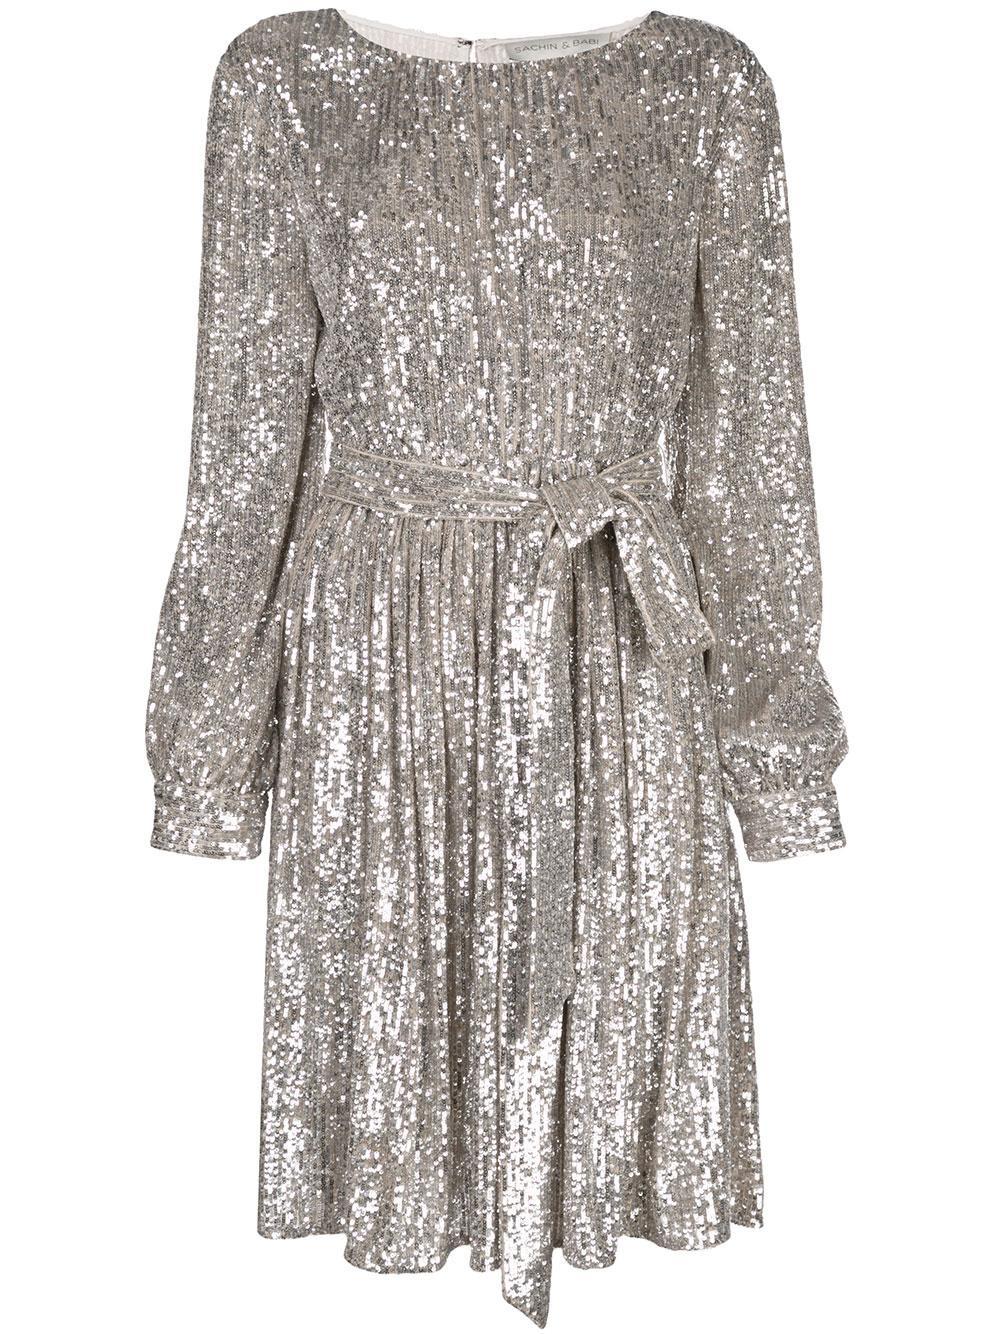 Chloe Long Sleeve Sequin Dress Item # F29D18